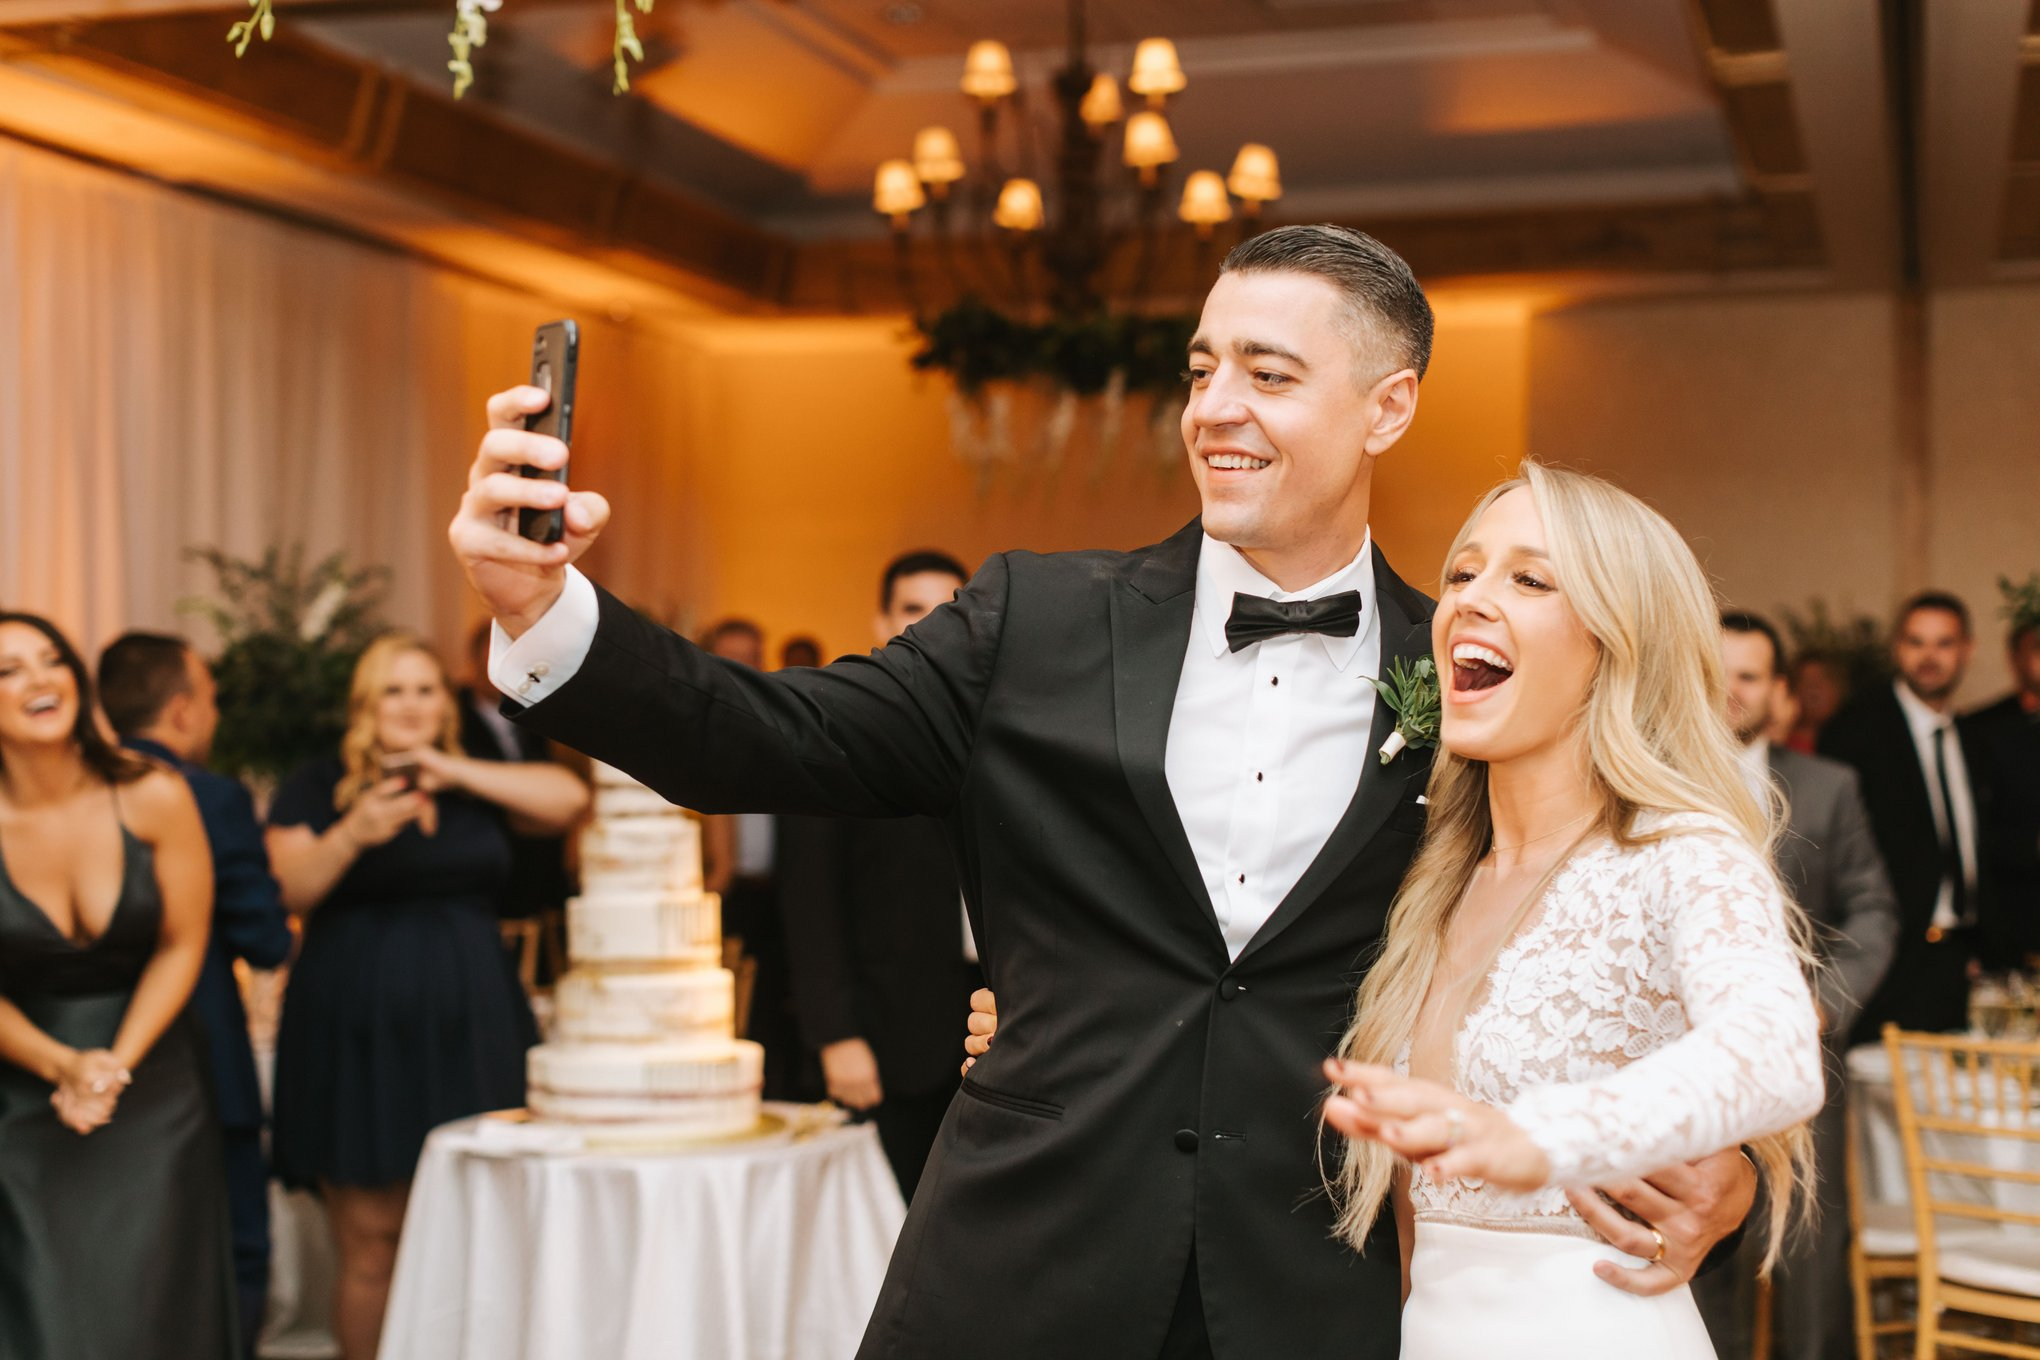 Wequassett-Wedding-Photographer-Cape-Cod-Boston-Lena-Mirisola-43.jpg